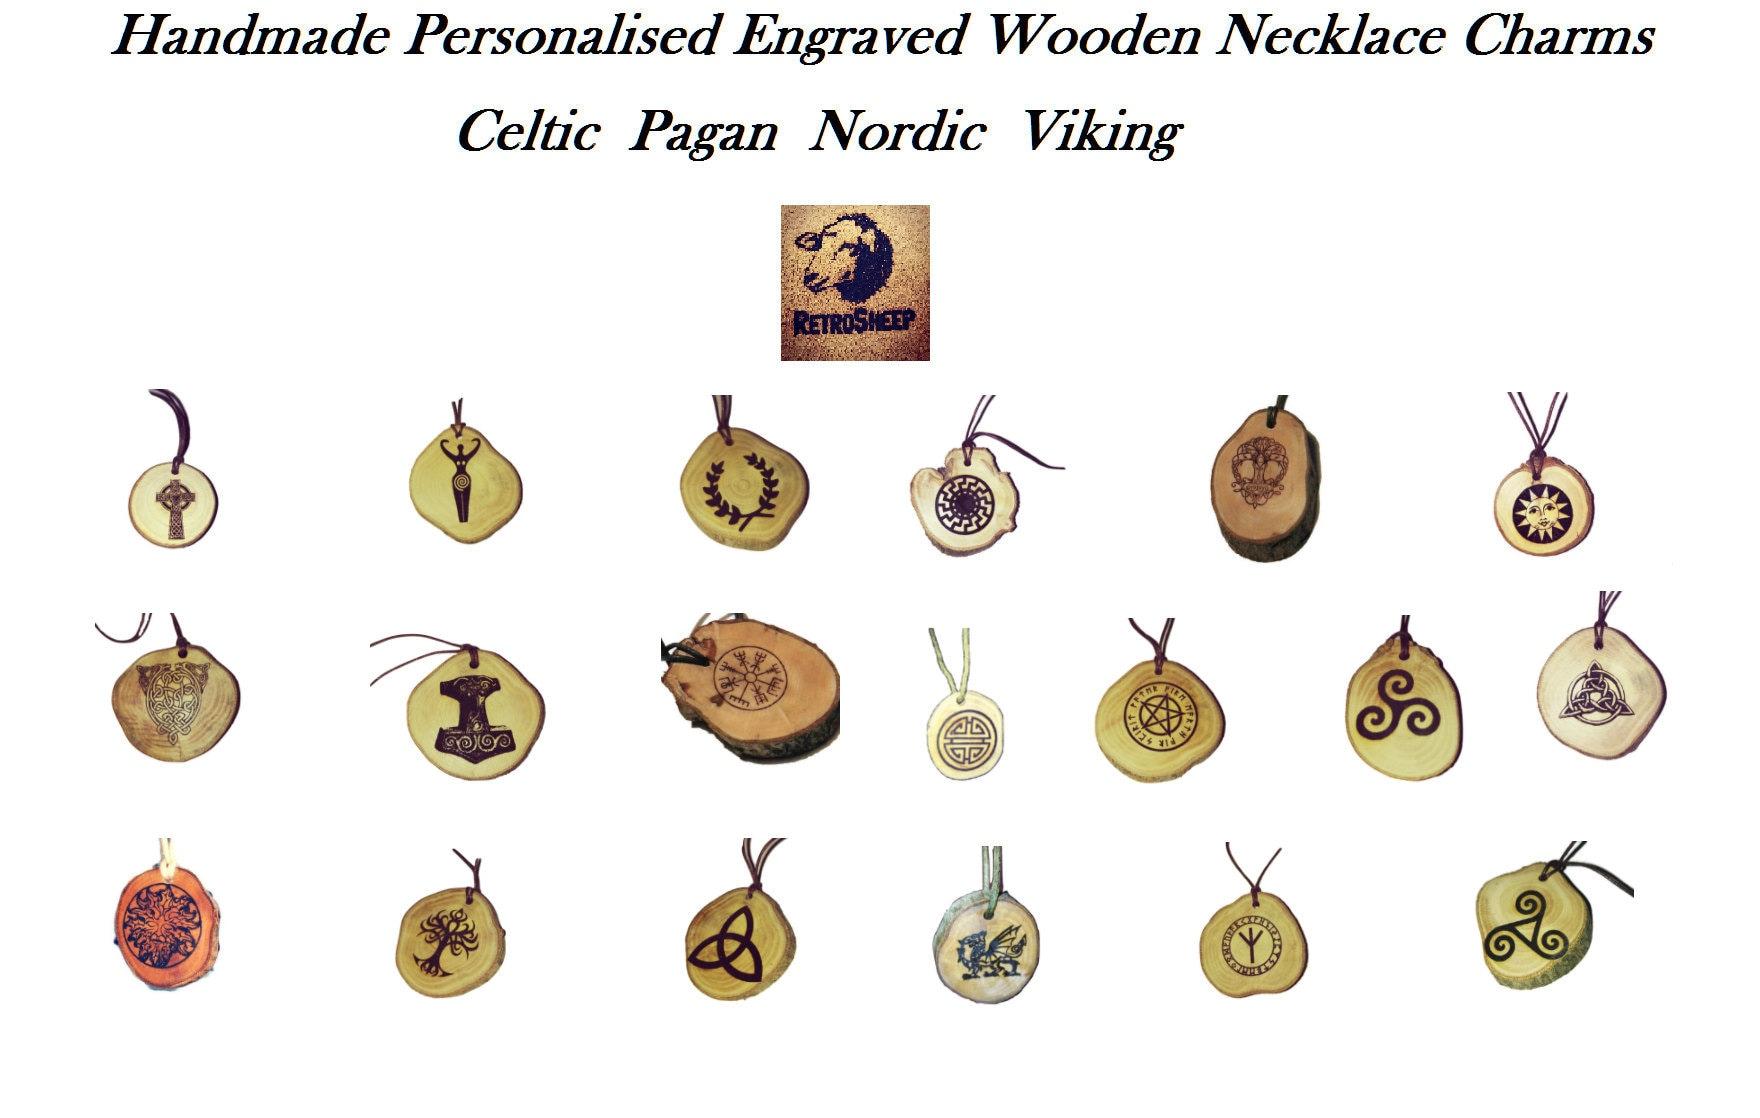 Handmade Personalised Engraved Gifts